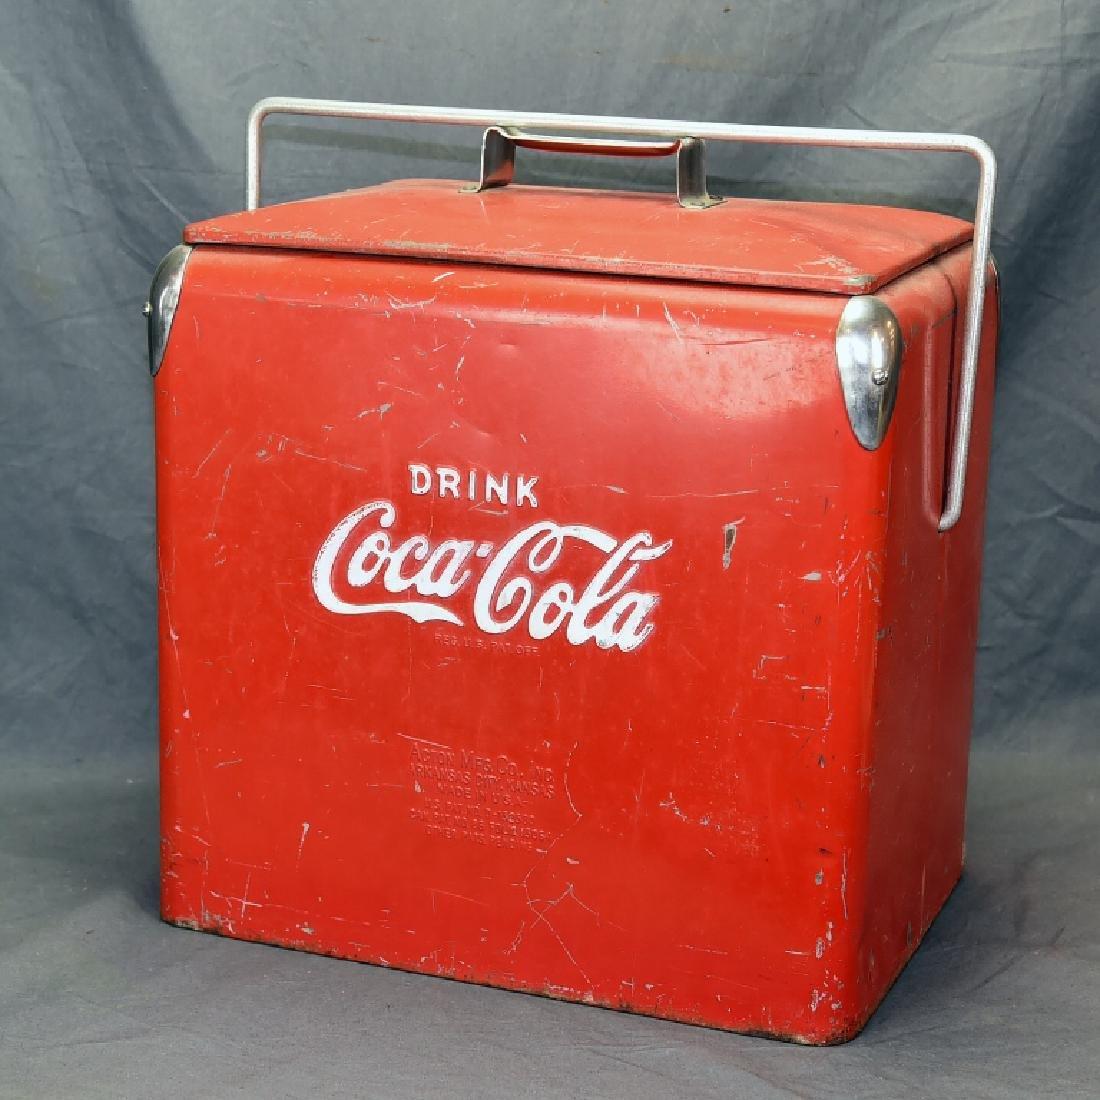 Red Metal Coca Cola Cooler Ice Chest - 4